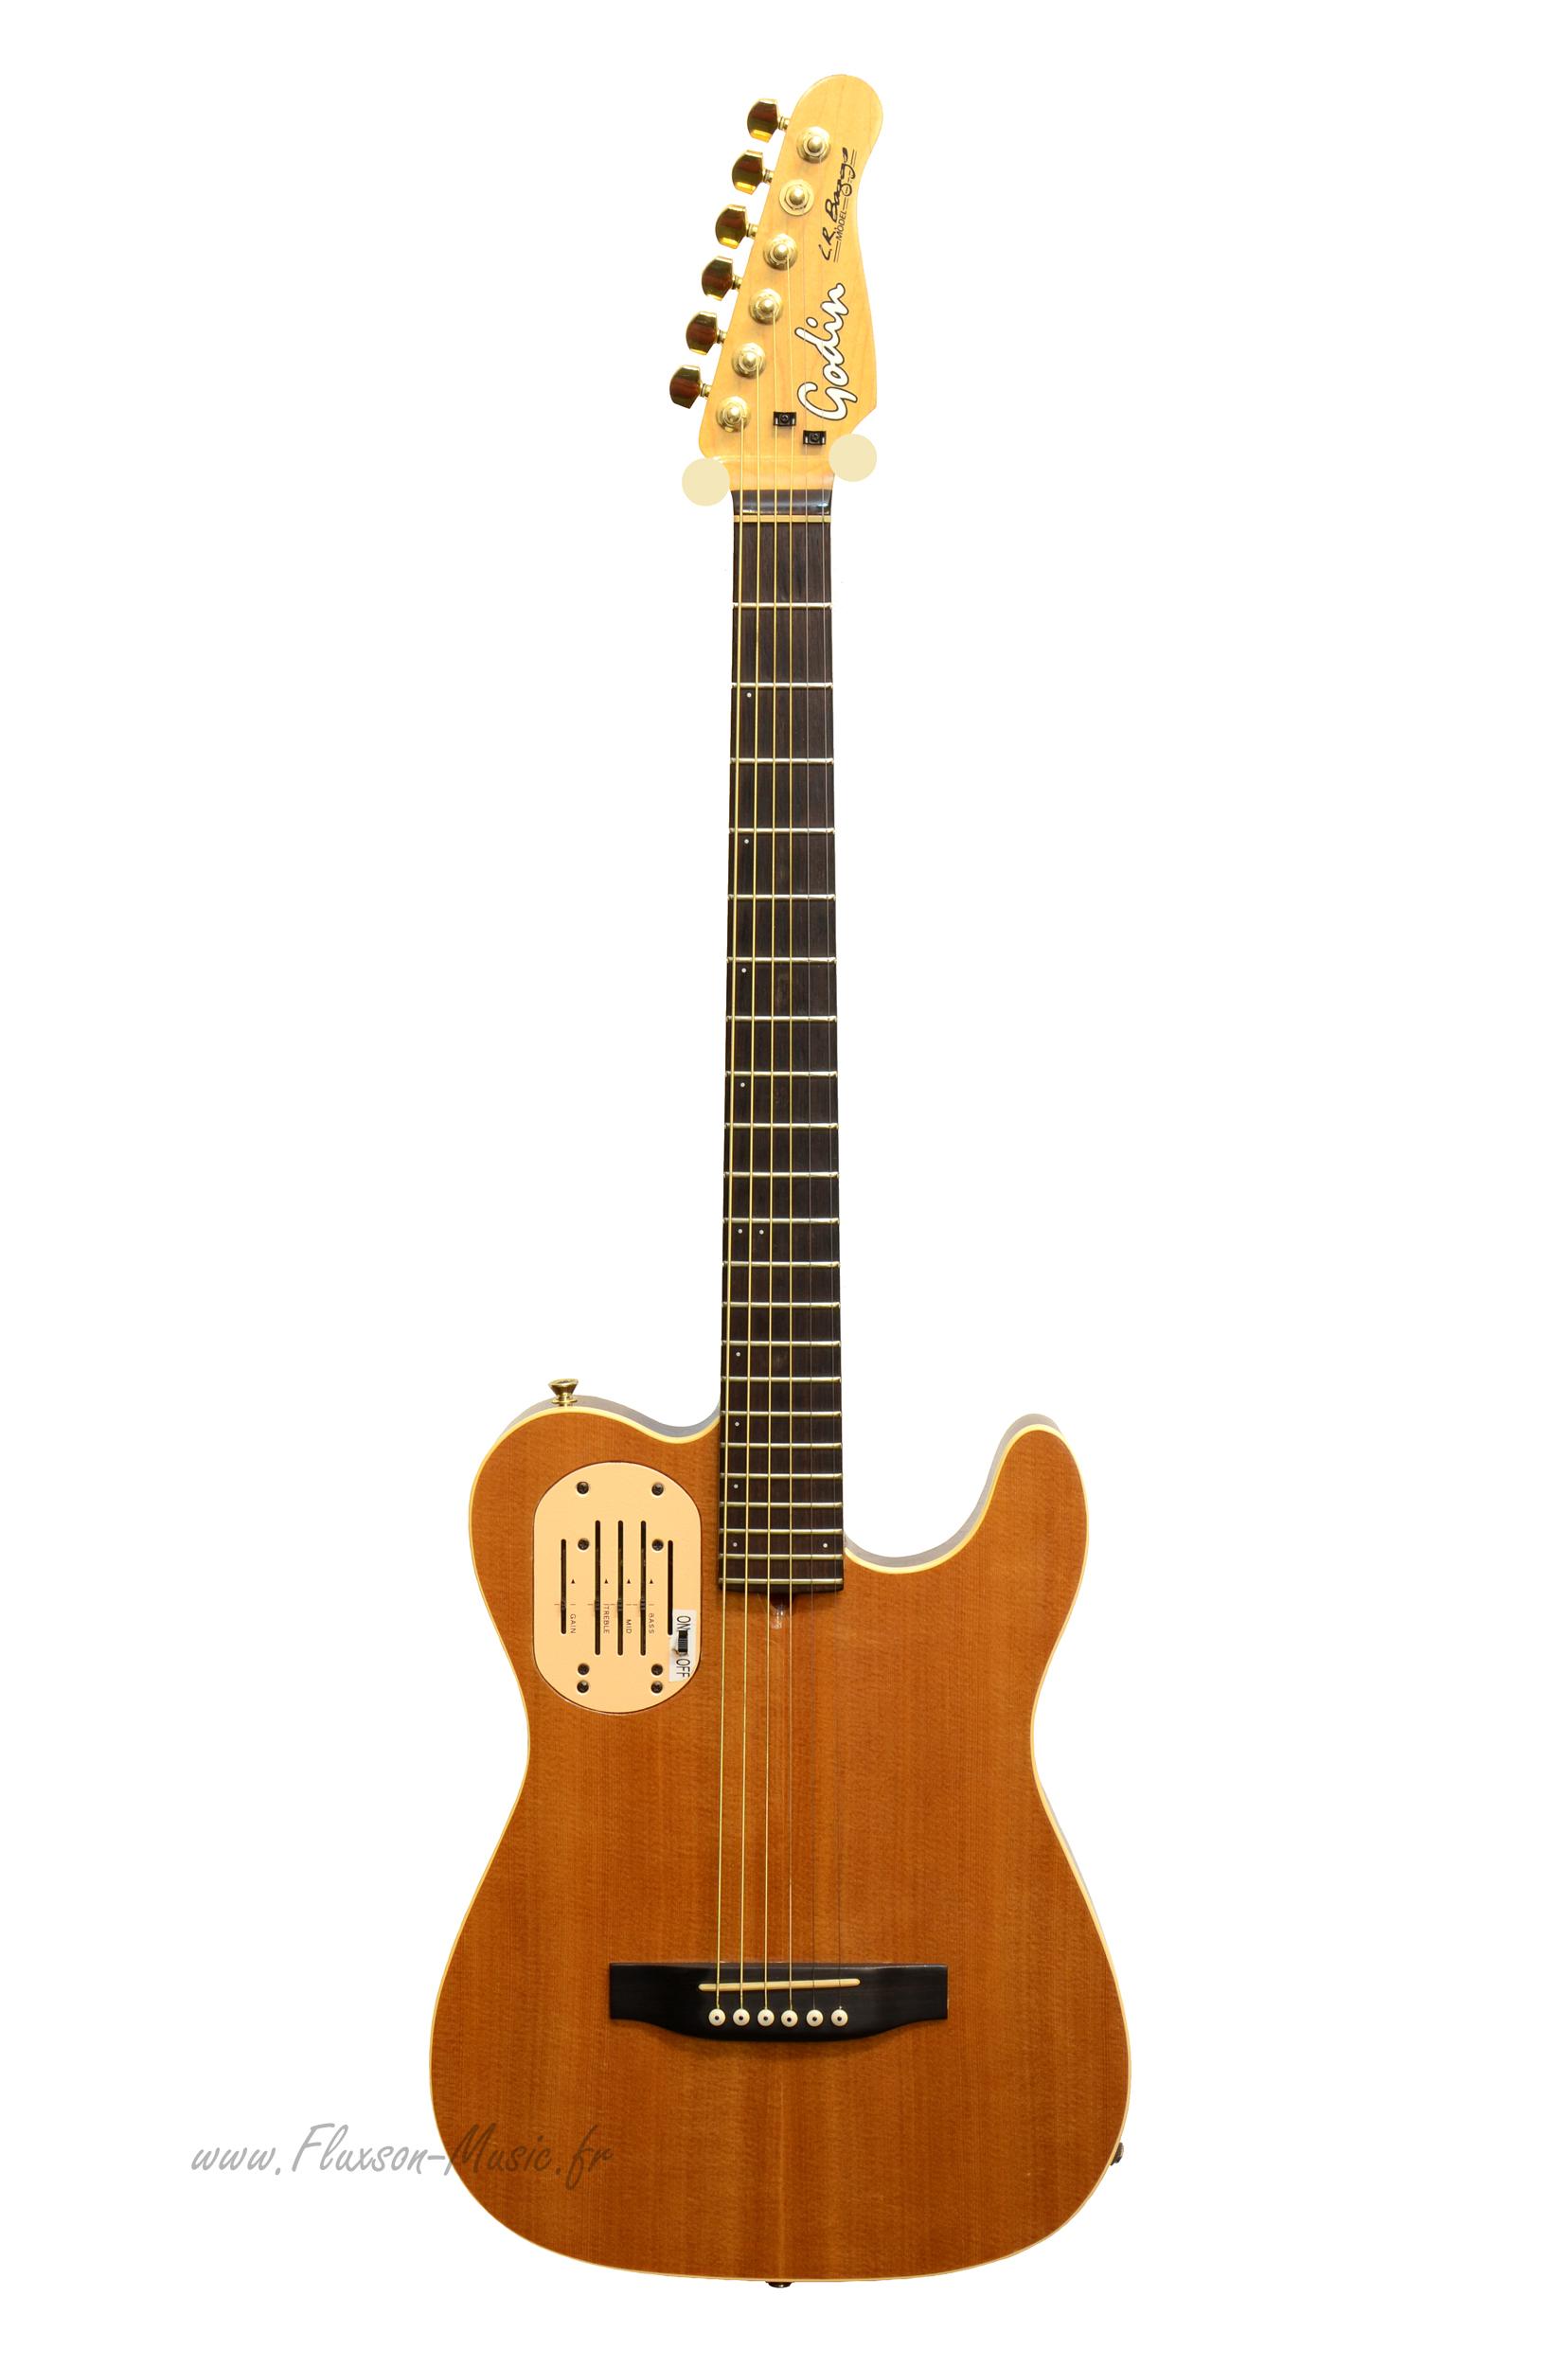 Godin Guitars For Sale : godin acousticaster 2003 natural satin guitar for sale fluxson music ~ Russianpoet.info Haus und Dekorationen